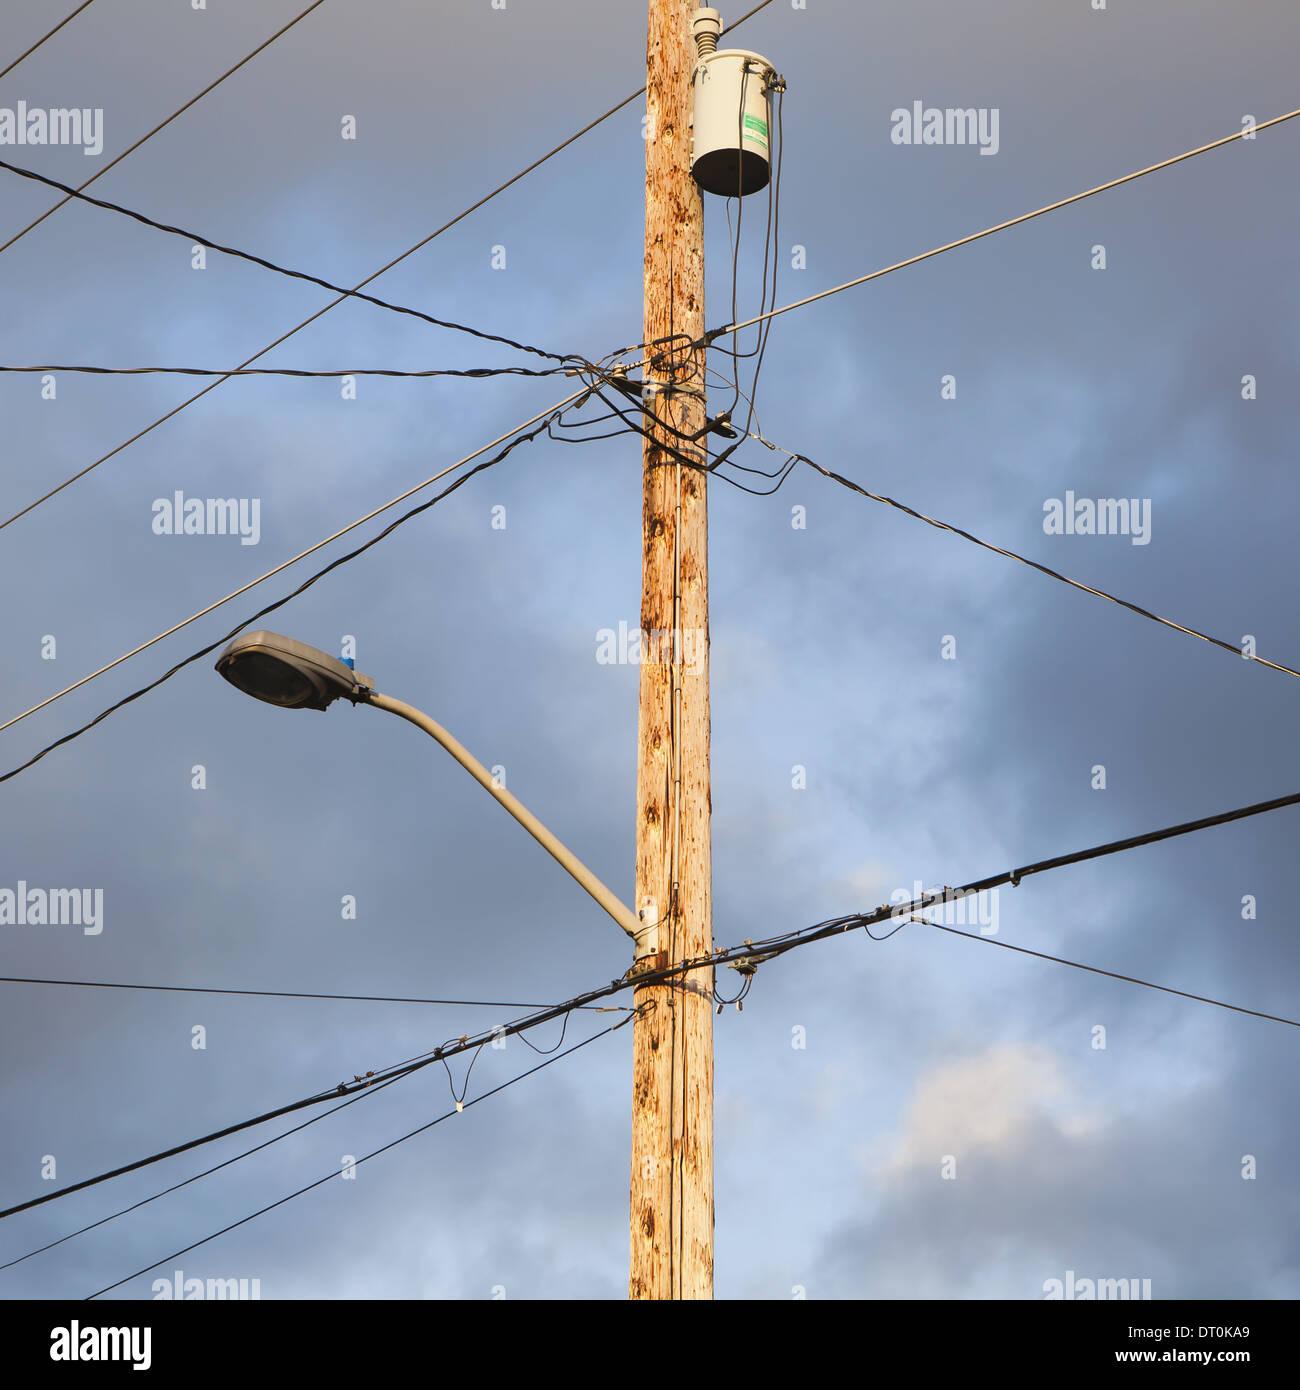 Wires Stockfotos & Wires Bilder - Alamy